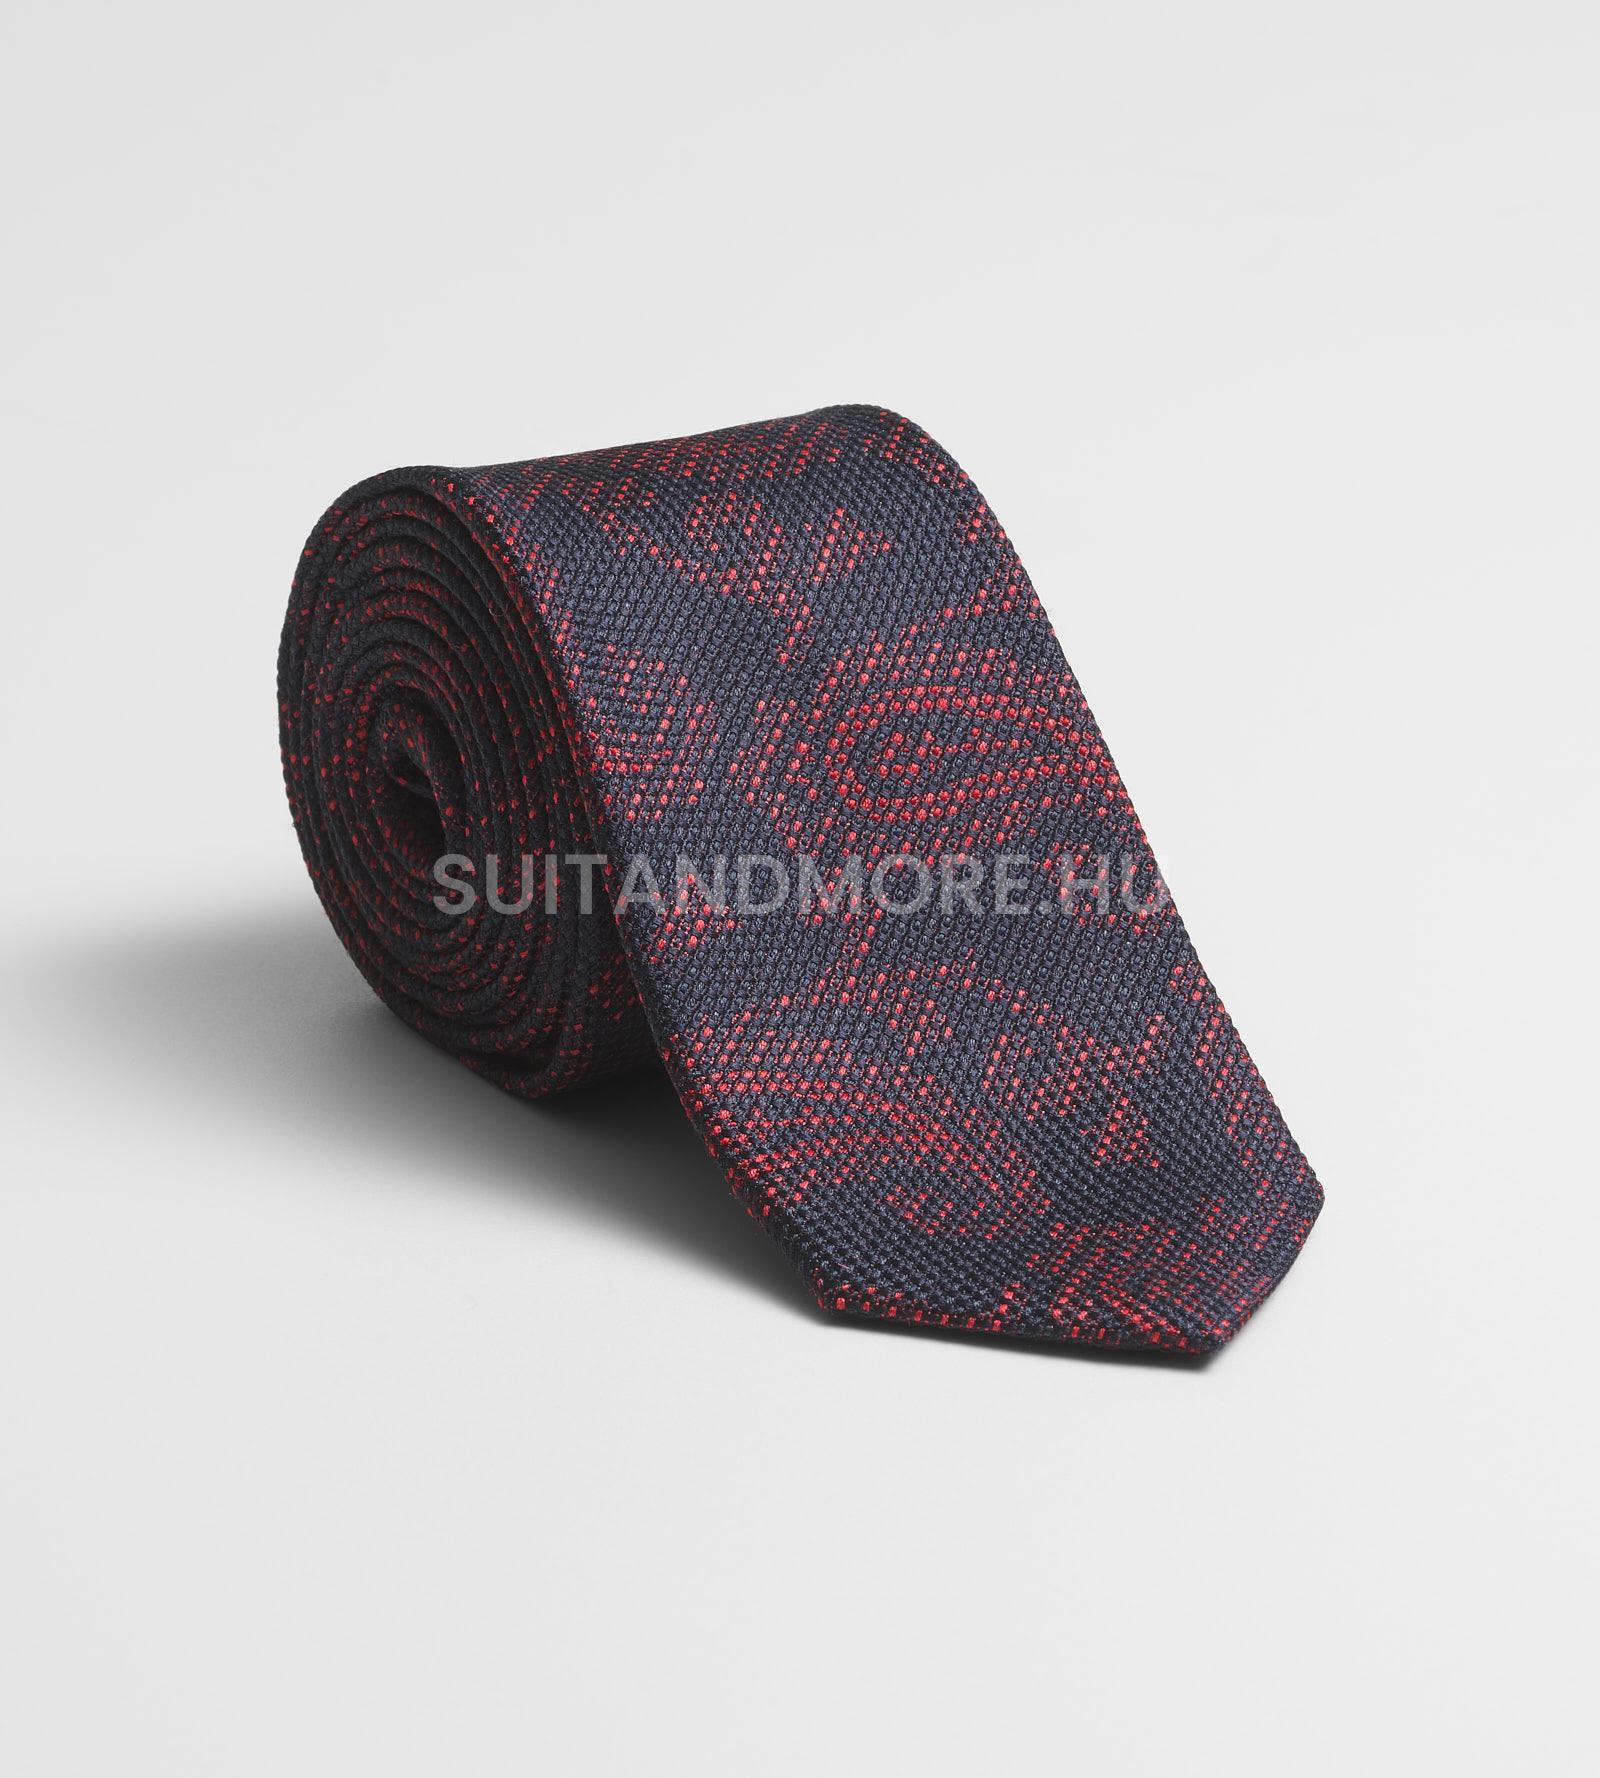 olymp-bordo-tiszta-selyem-eskuvoi-nyakkendo-1741-51-35-01